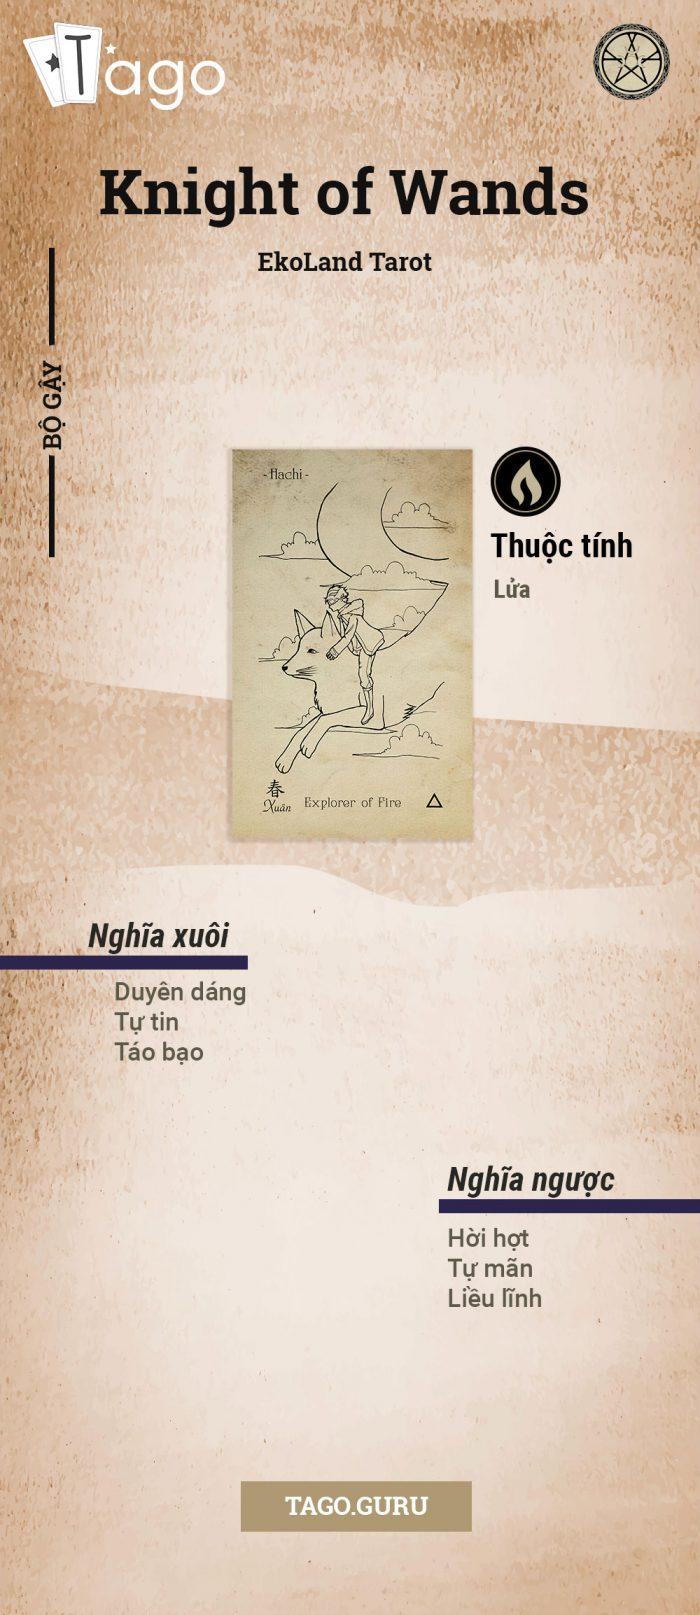 TAGO-Info-Bai-Tarot-Knight-of-wands